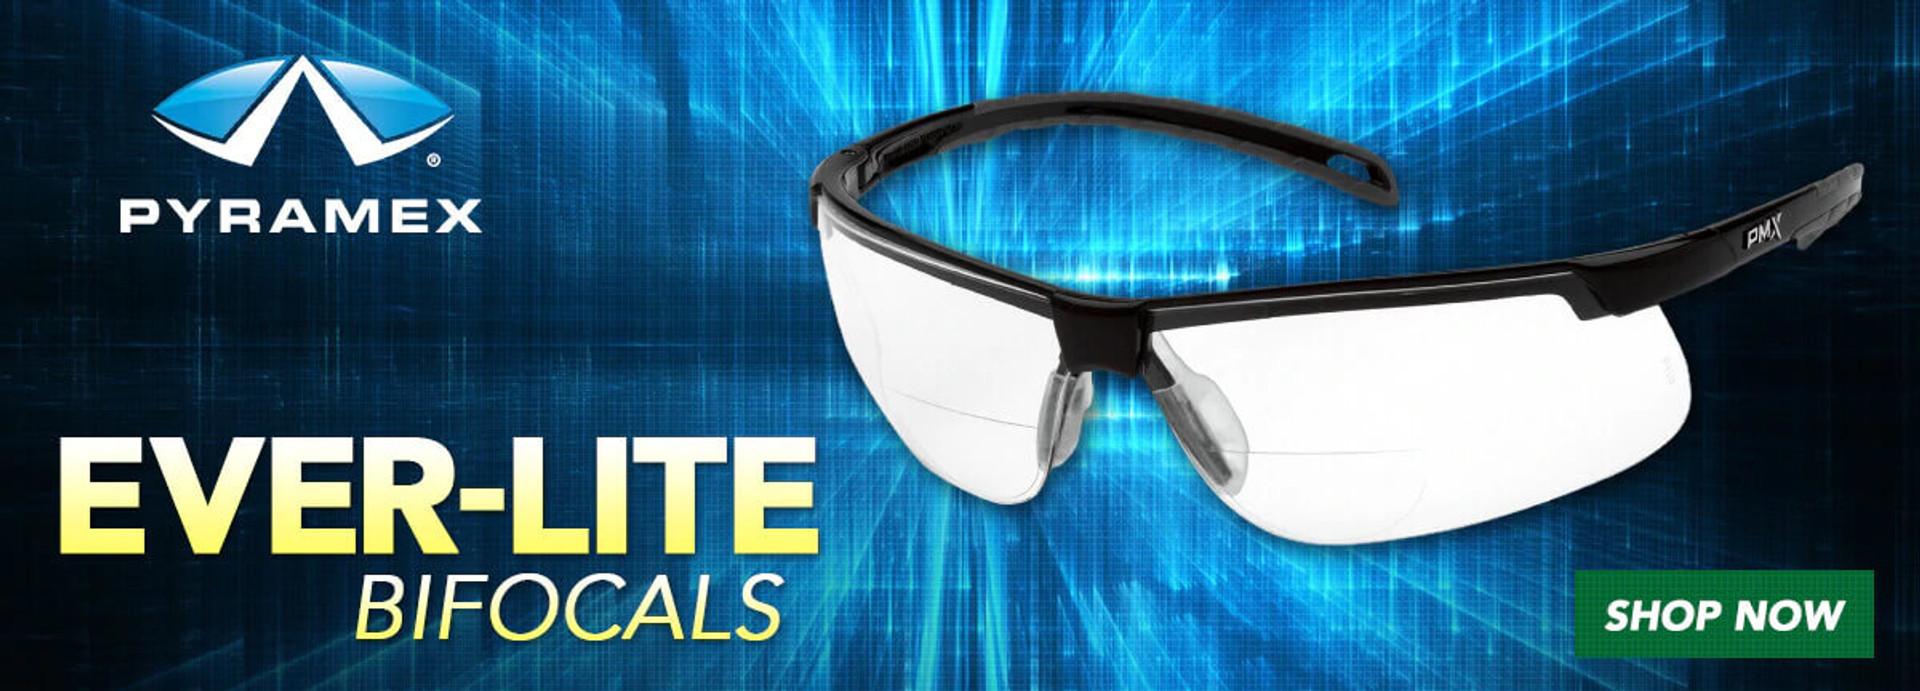 Pyramex Ever-Lite Bifocal Safety Glasses